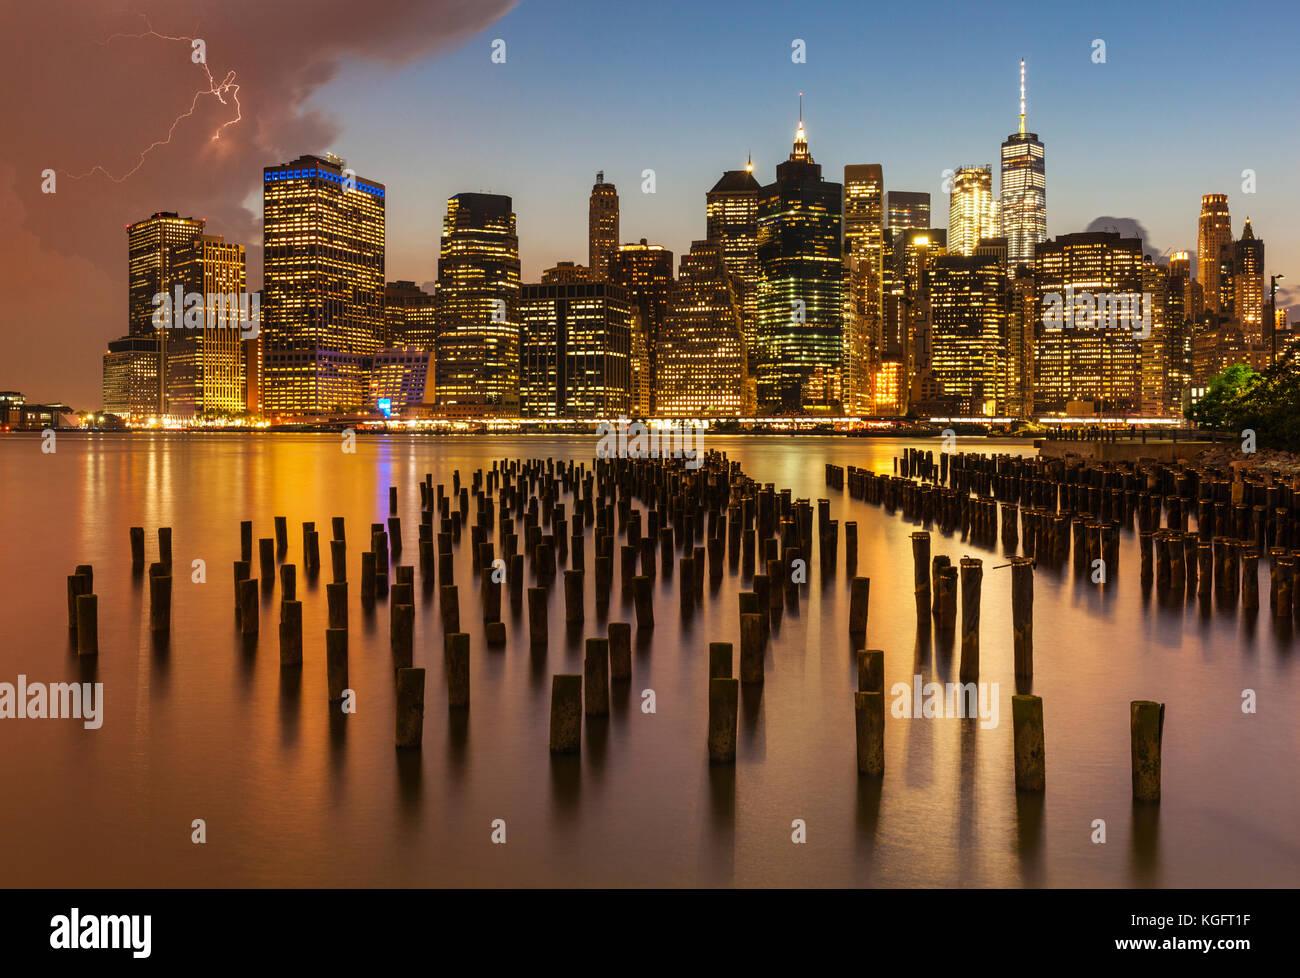 Horizonte de Nueva York Nueva York Estados Unidos Nueva York Manhattan skyline cielo tormentoso próximos a Imagen De Stock